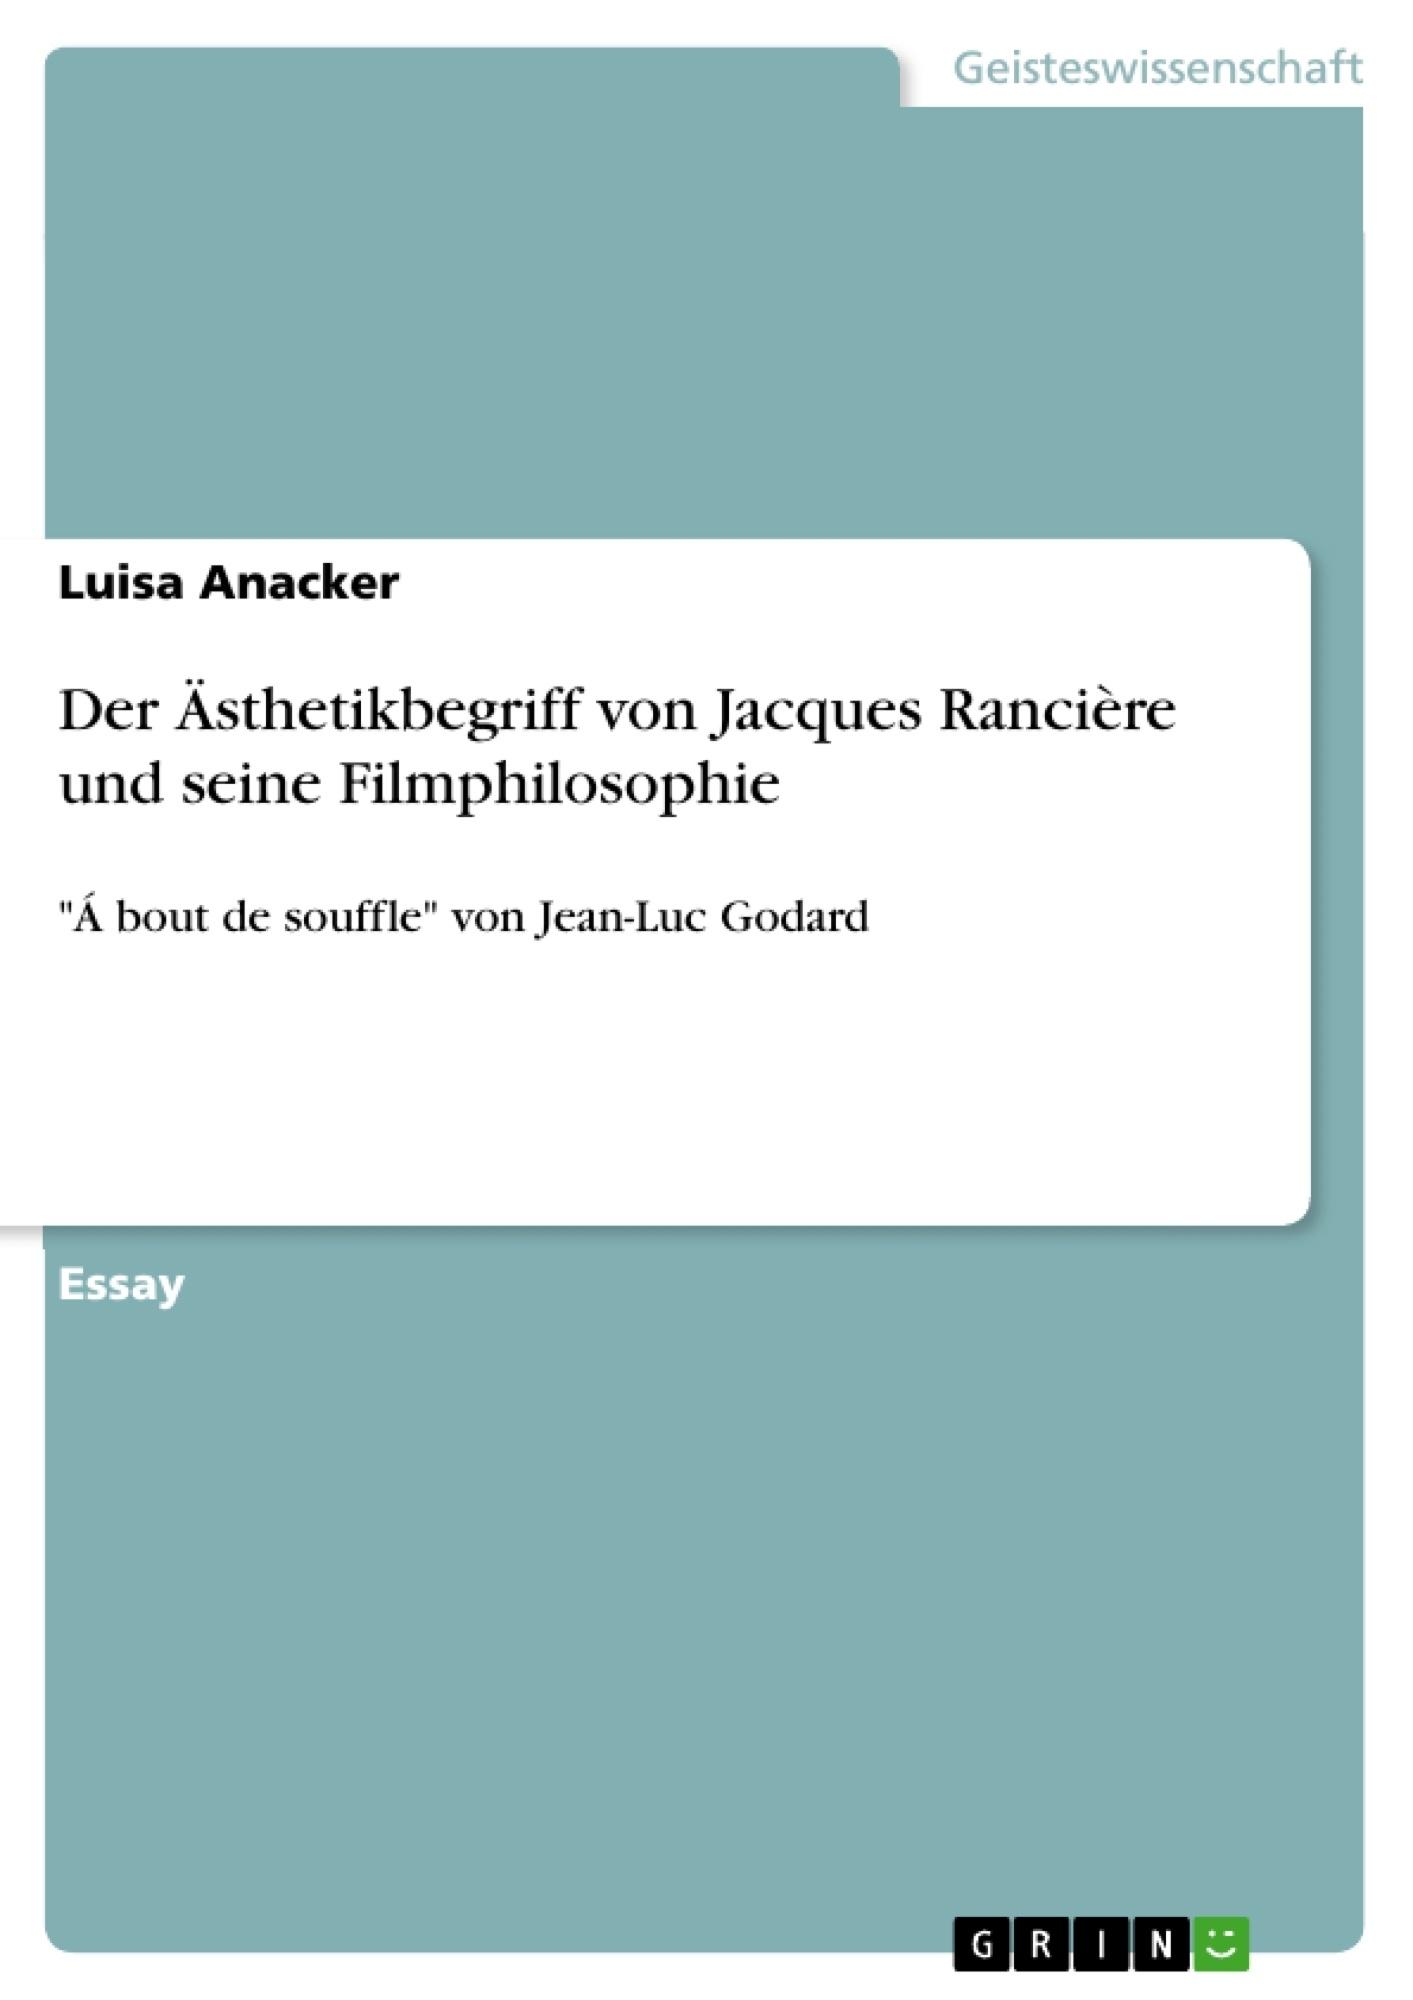 Titel: Der Ästhetikbegriff von Jacques Rancière und seine Filmphilosophie